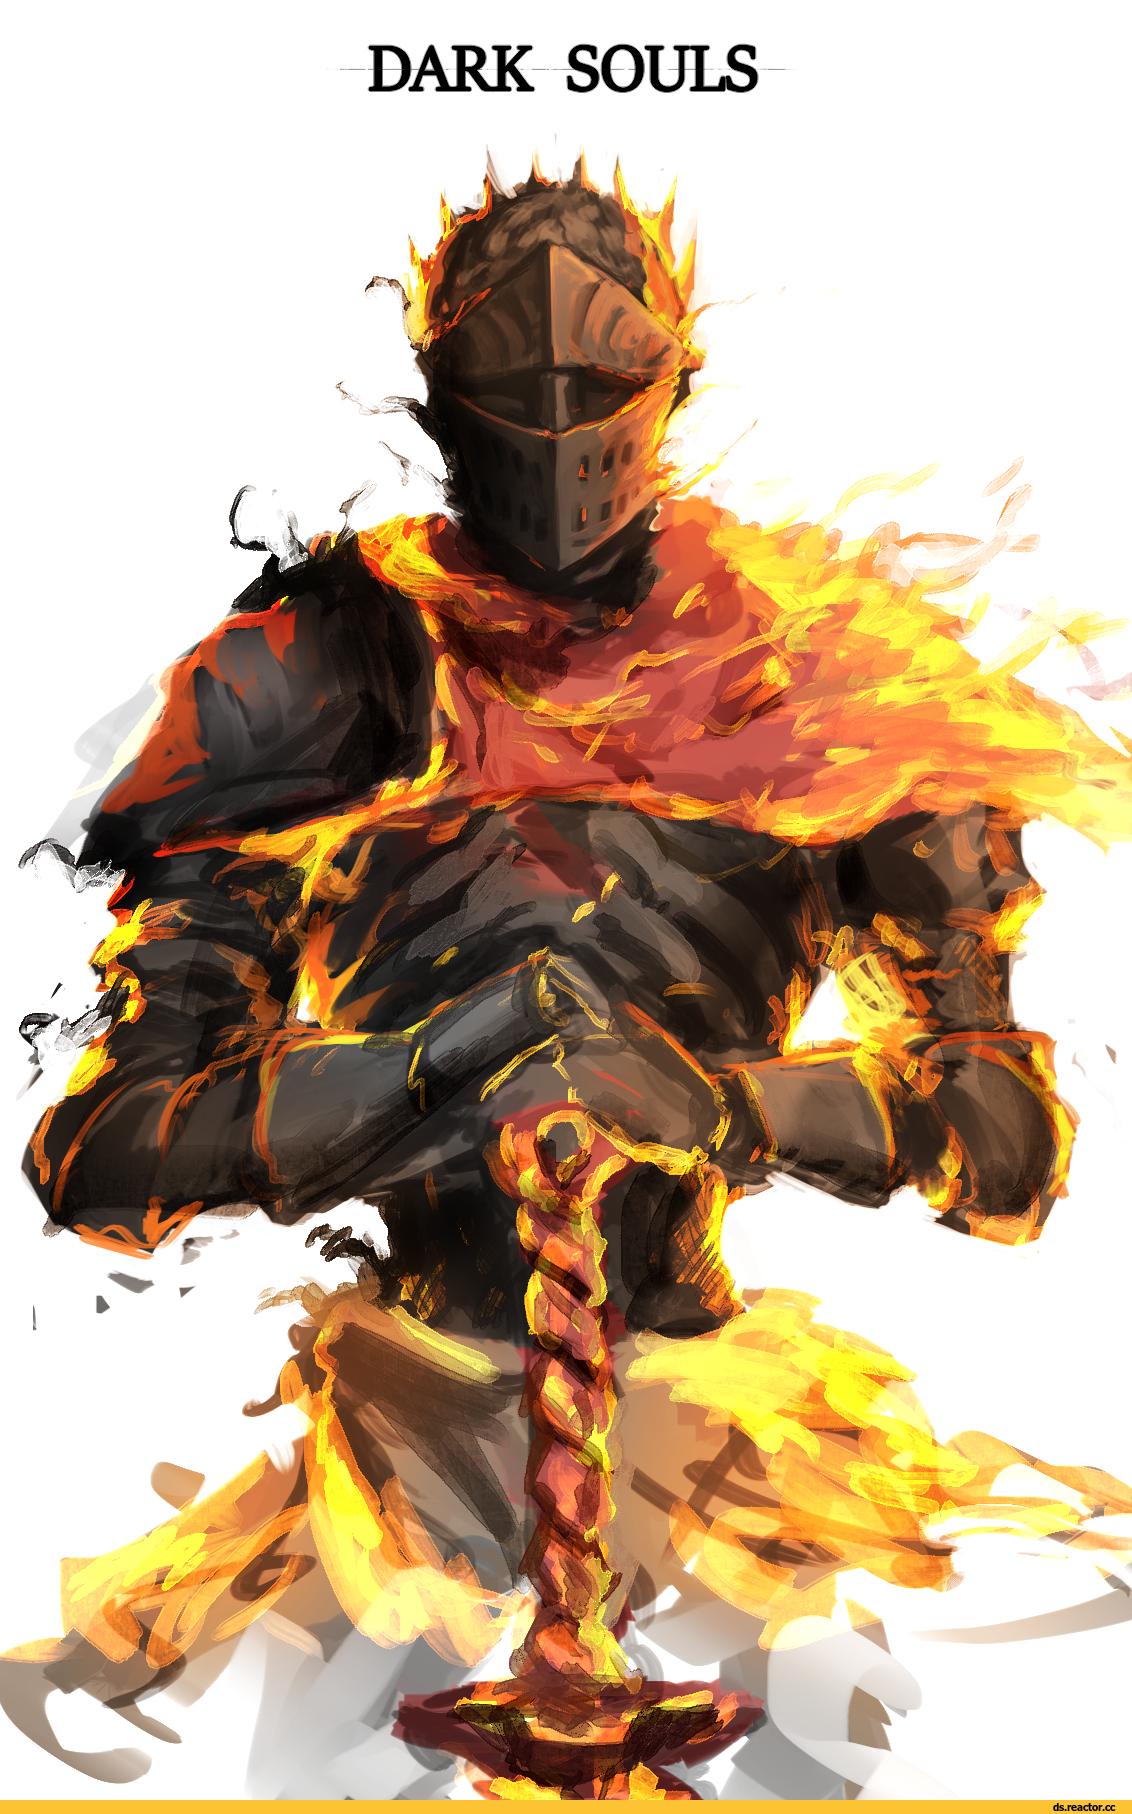 Pin By Bryan Terbaklau Ooi On Characters Dark Souls Knight Armor Dark Souls Armor